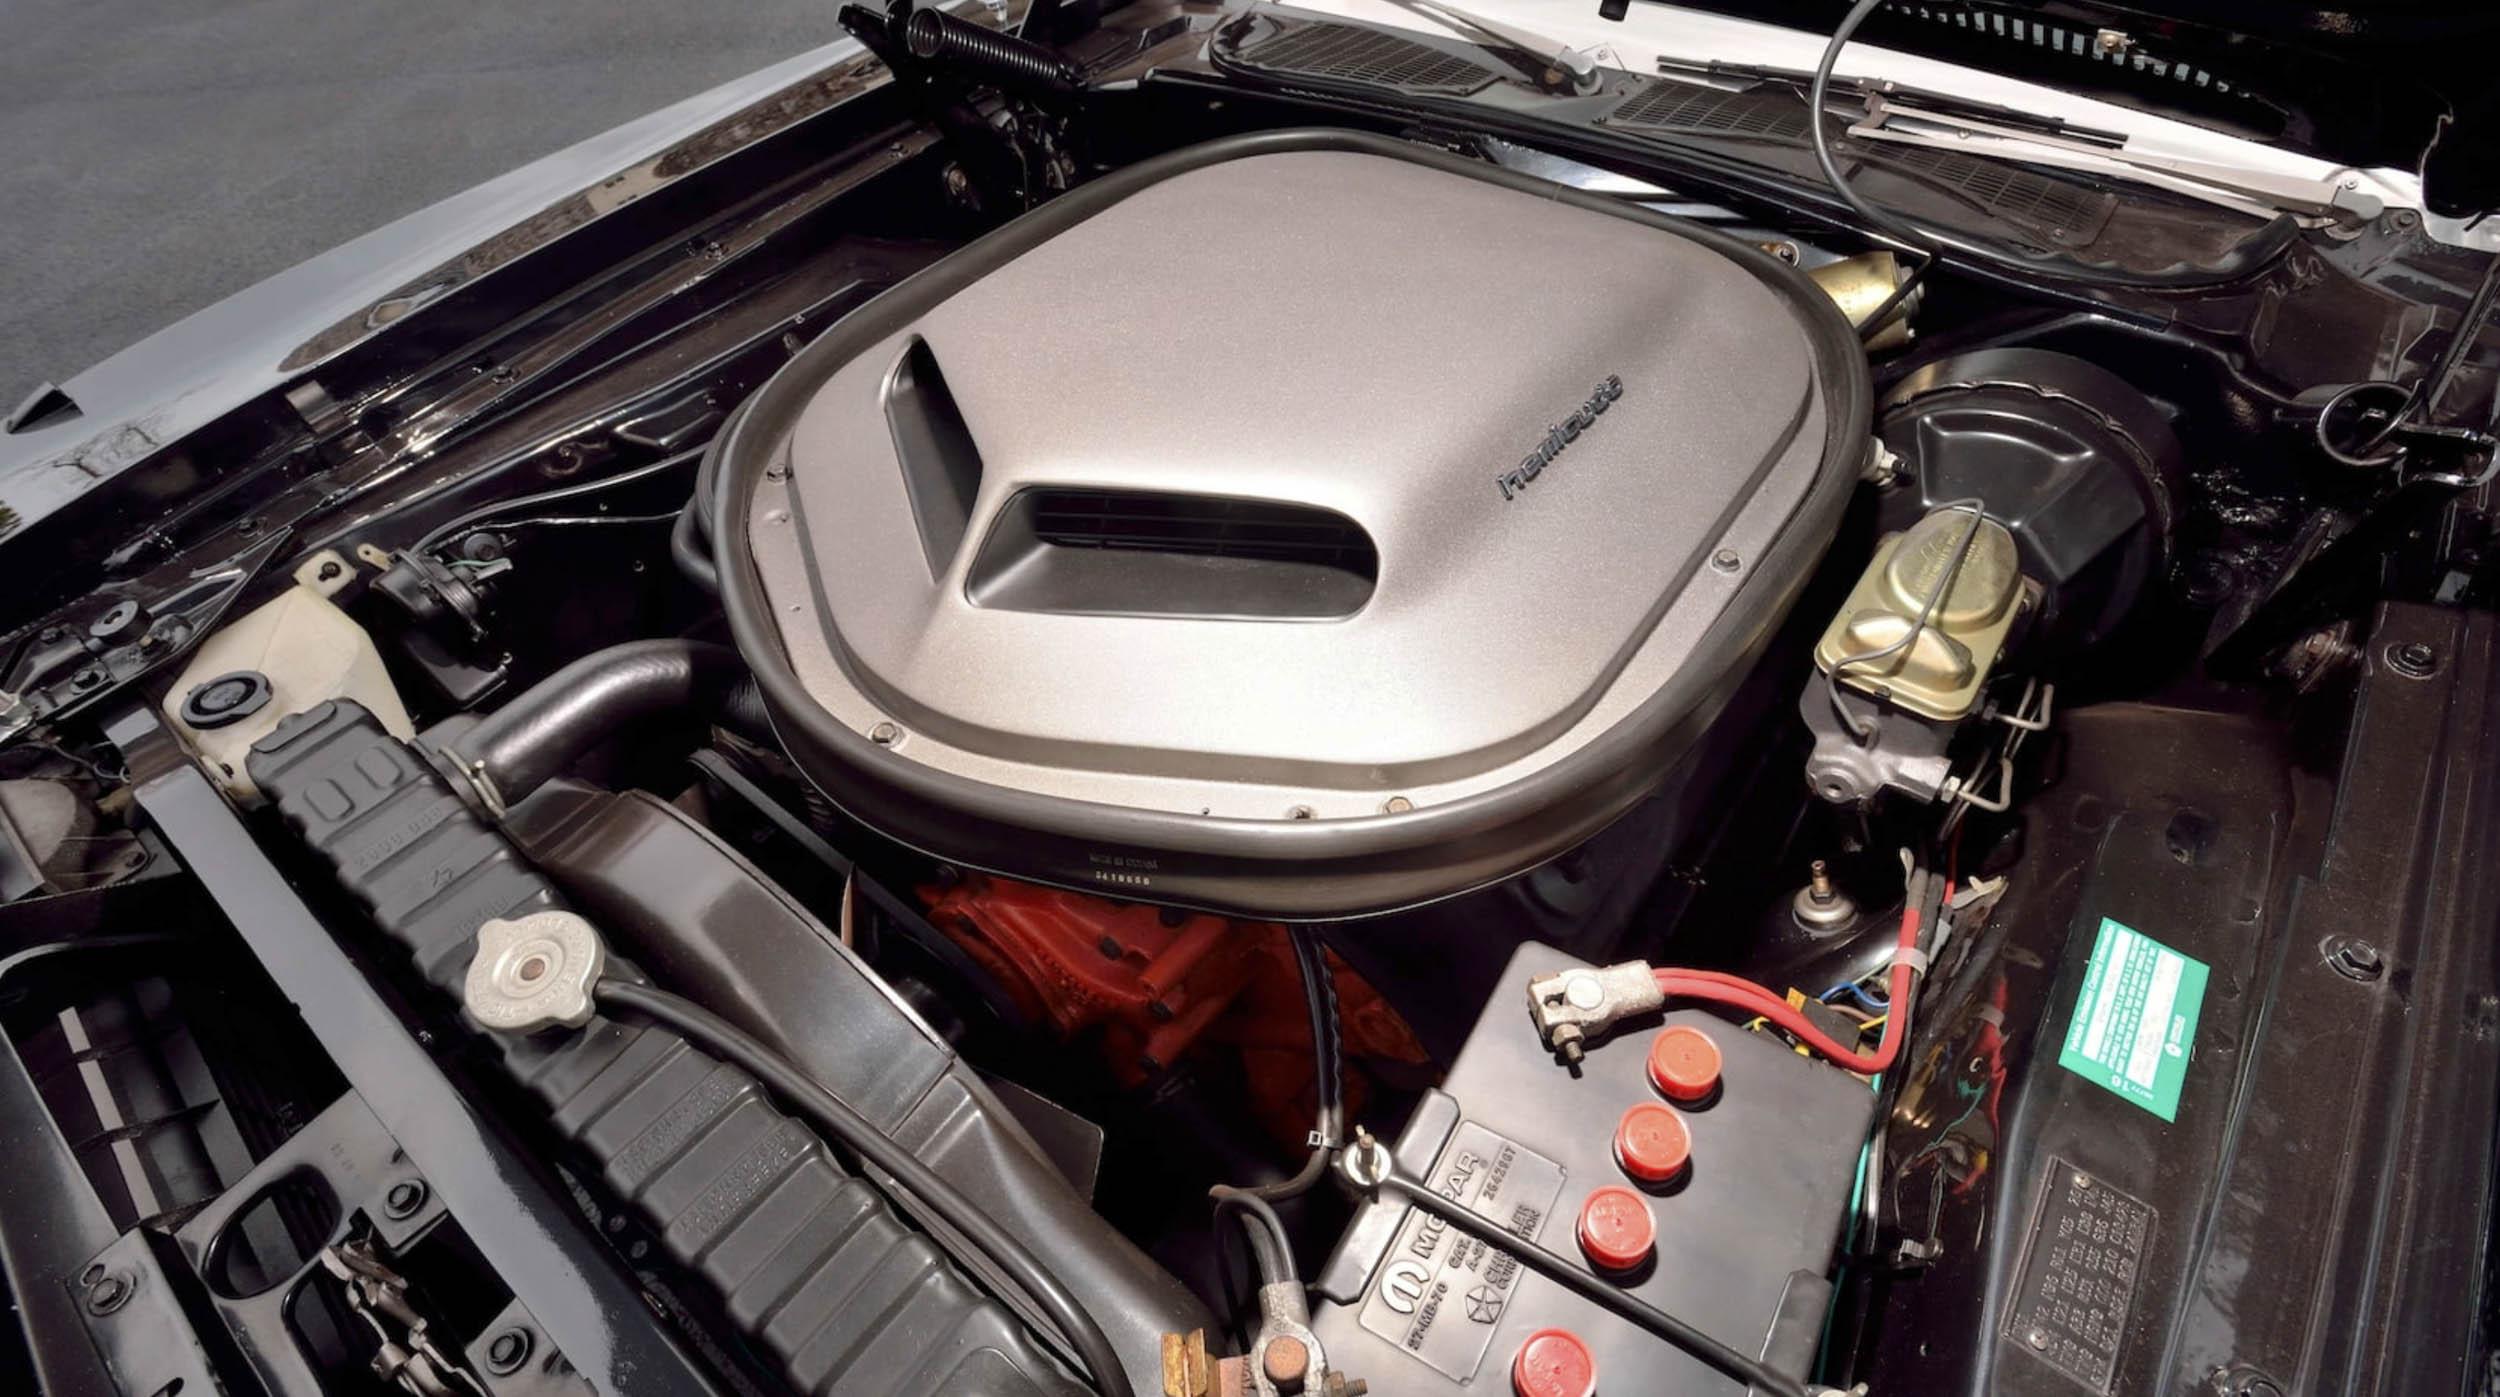 1970 Plymouth Hemi Cuda 426 engine